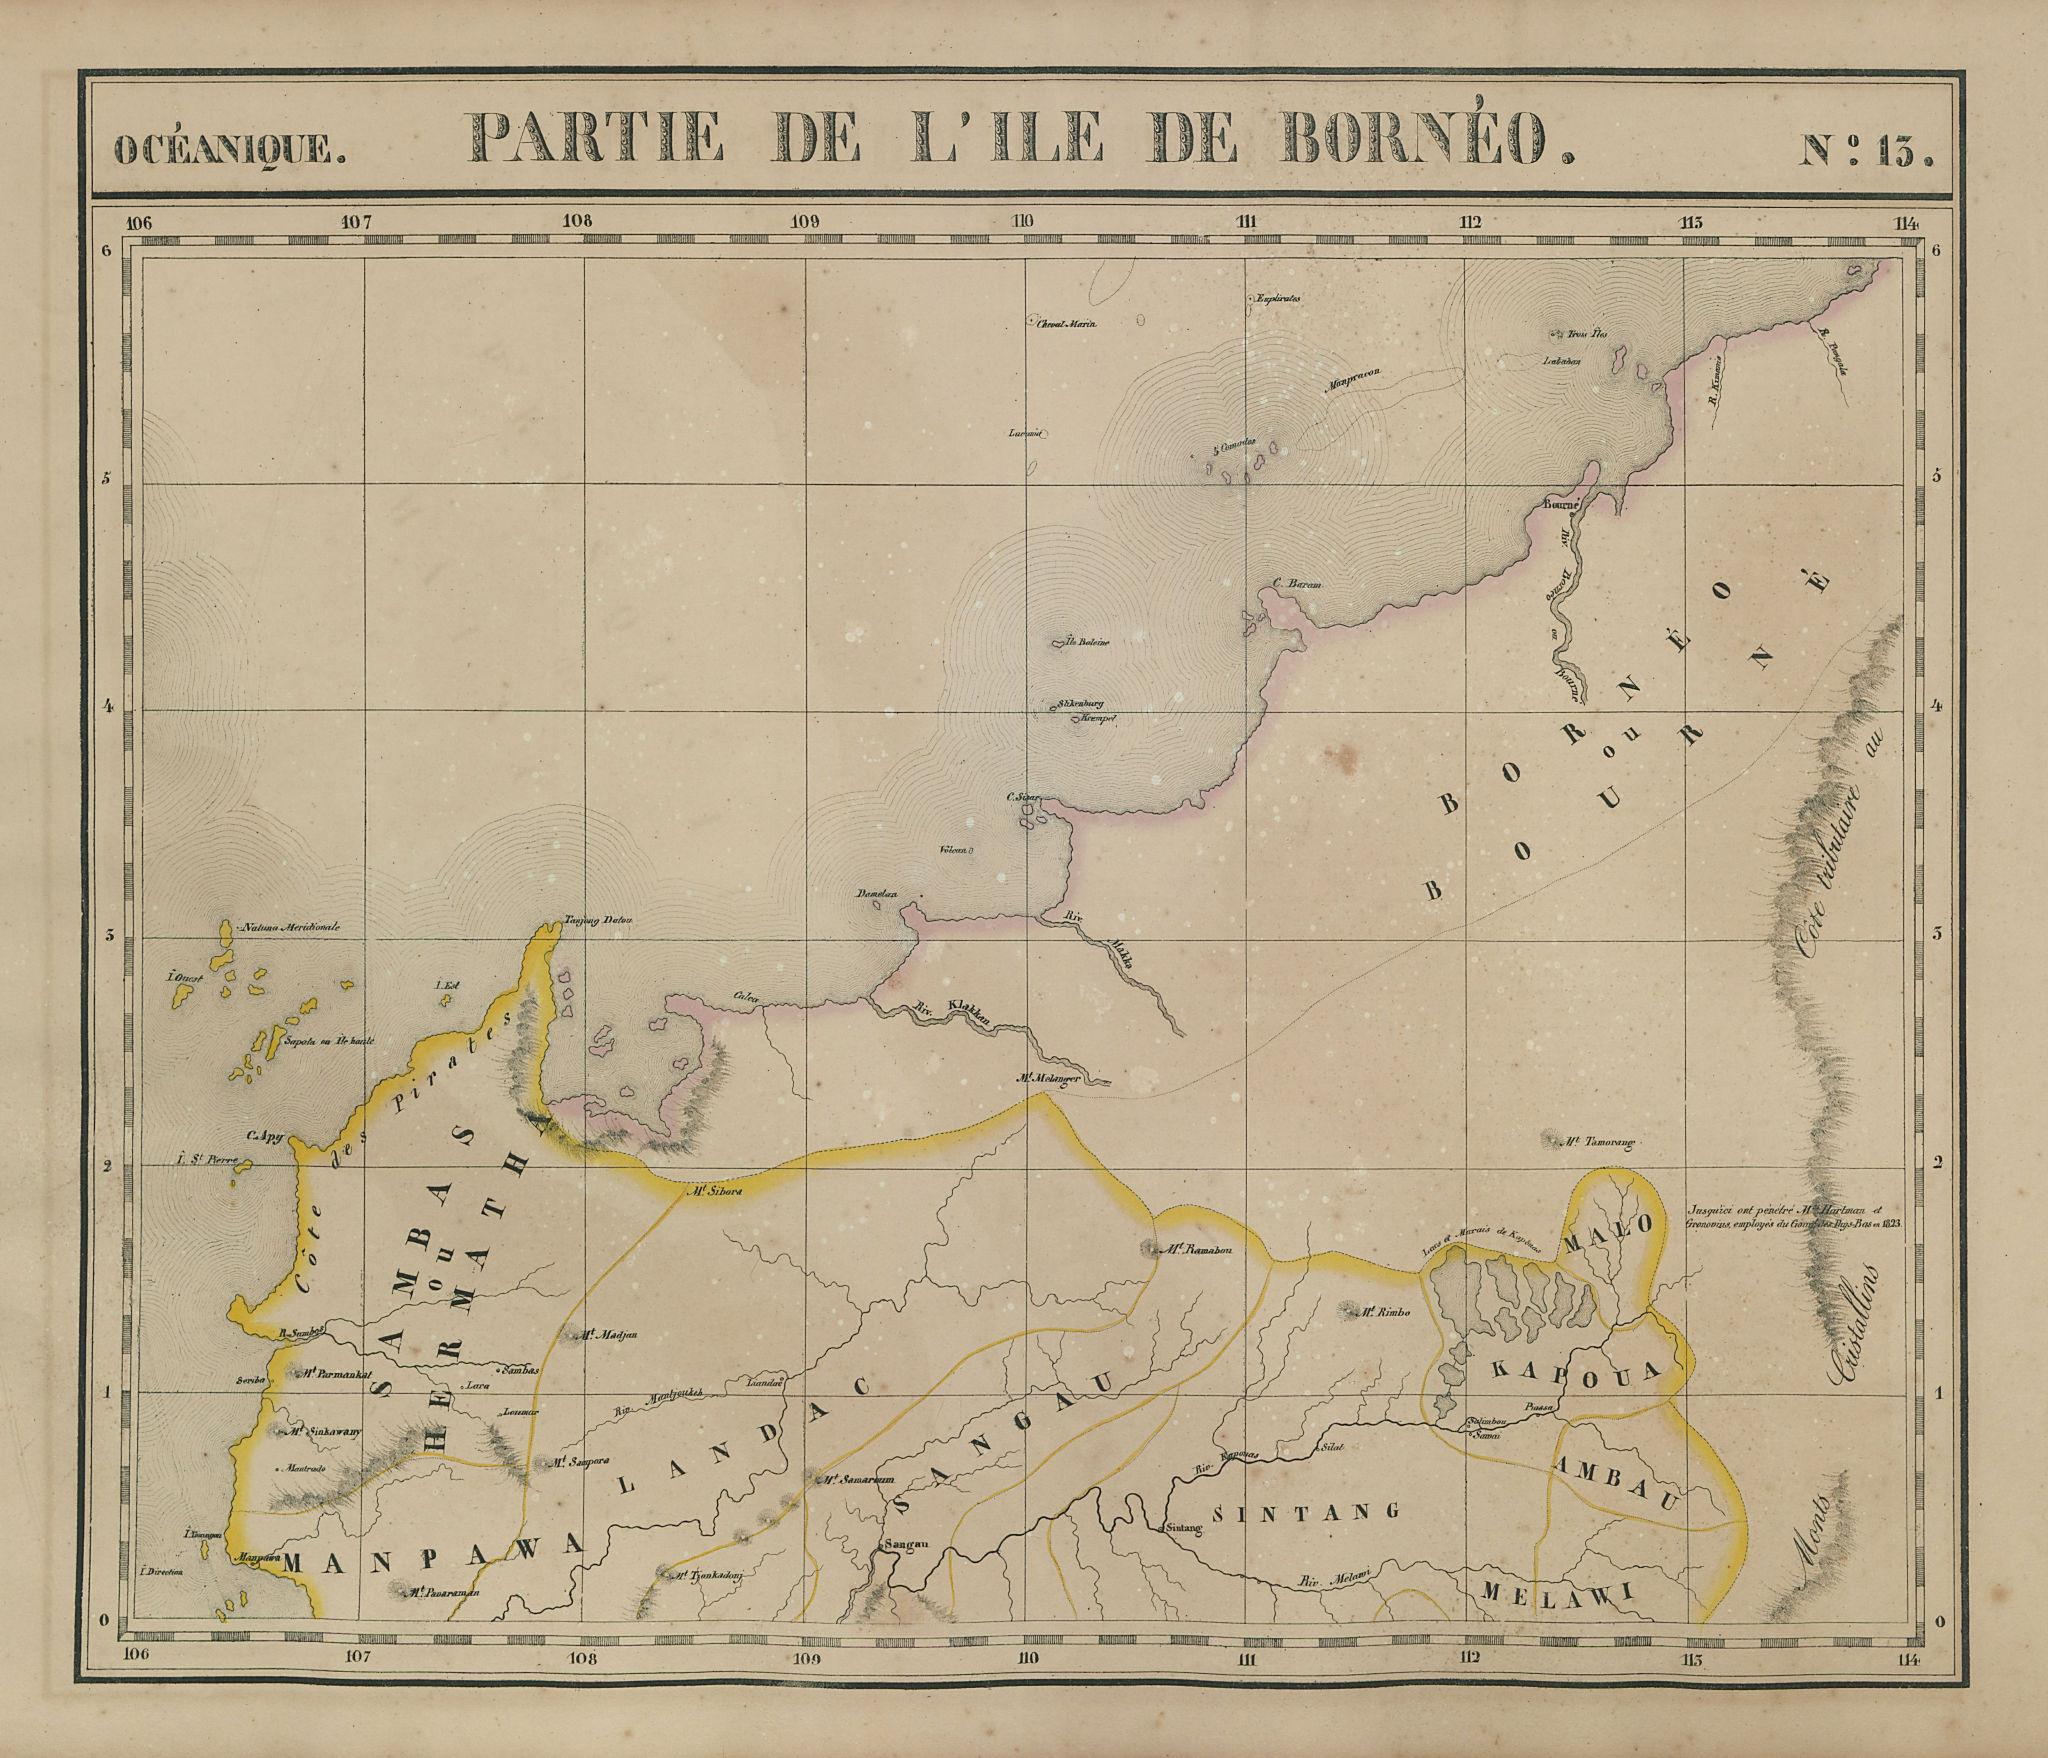 Océanique Partie de l'Ile de Bornéo #13 Northwest Borneo VANDERMAELEN 1827 map